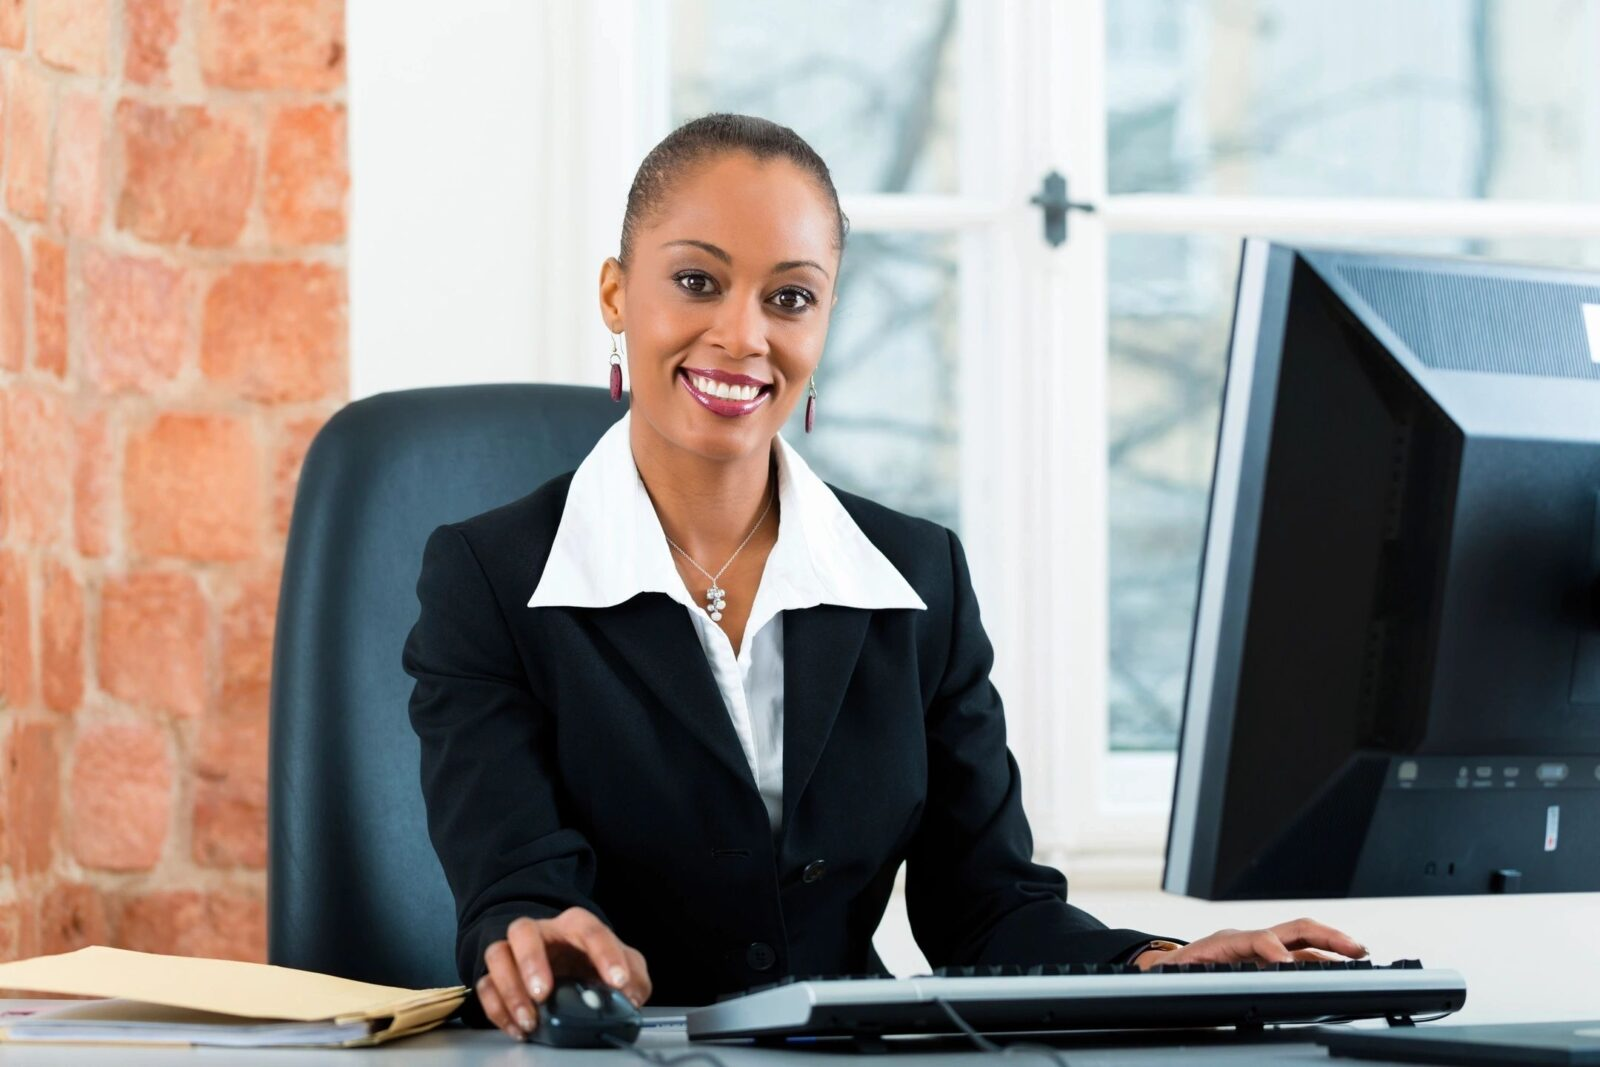 Digital Agency Business Owner